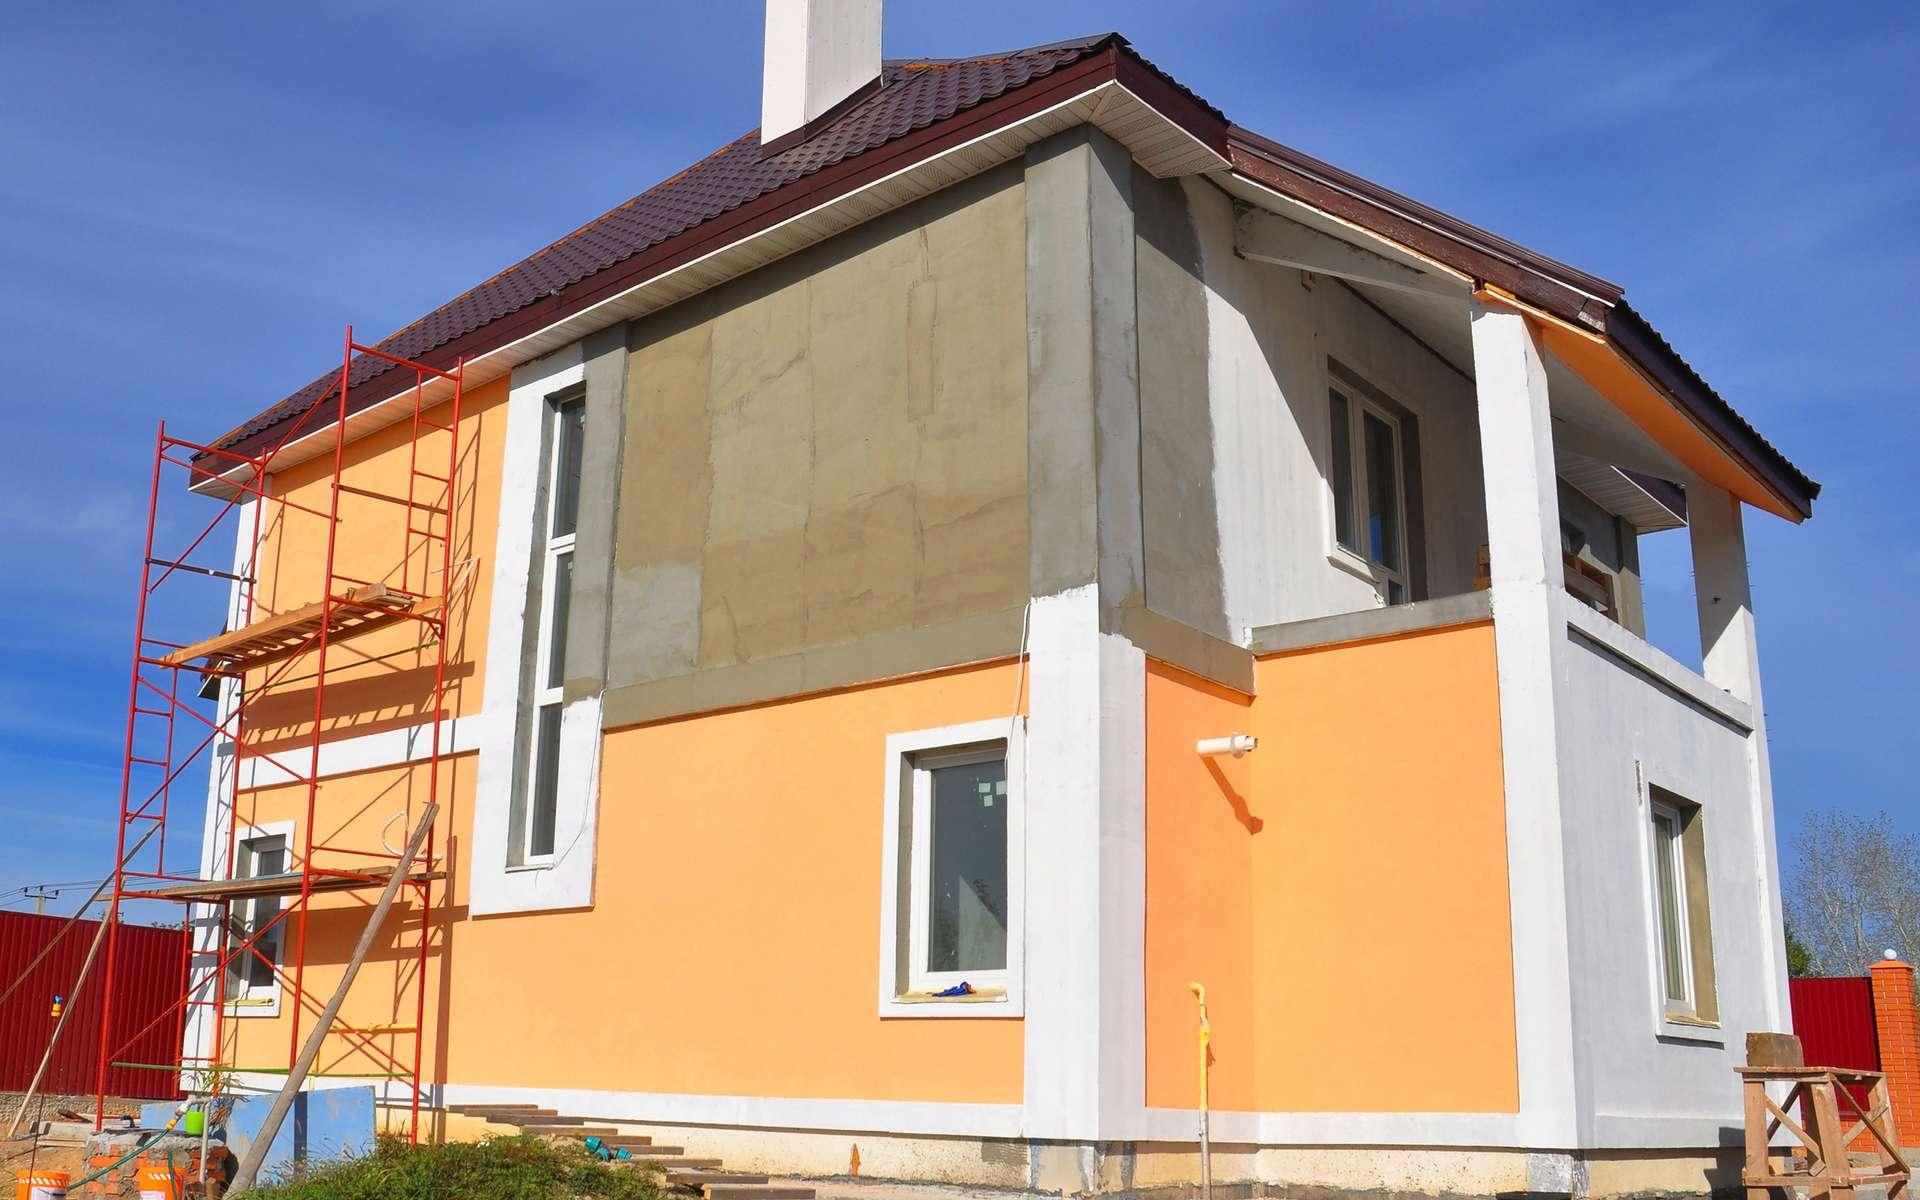 Travaux de peinture de façade © bildlove, AdobeStock